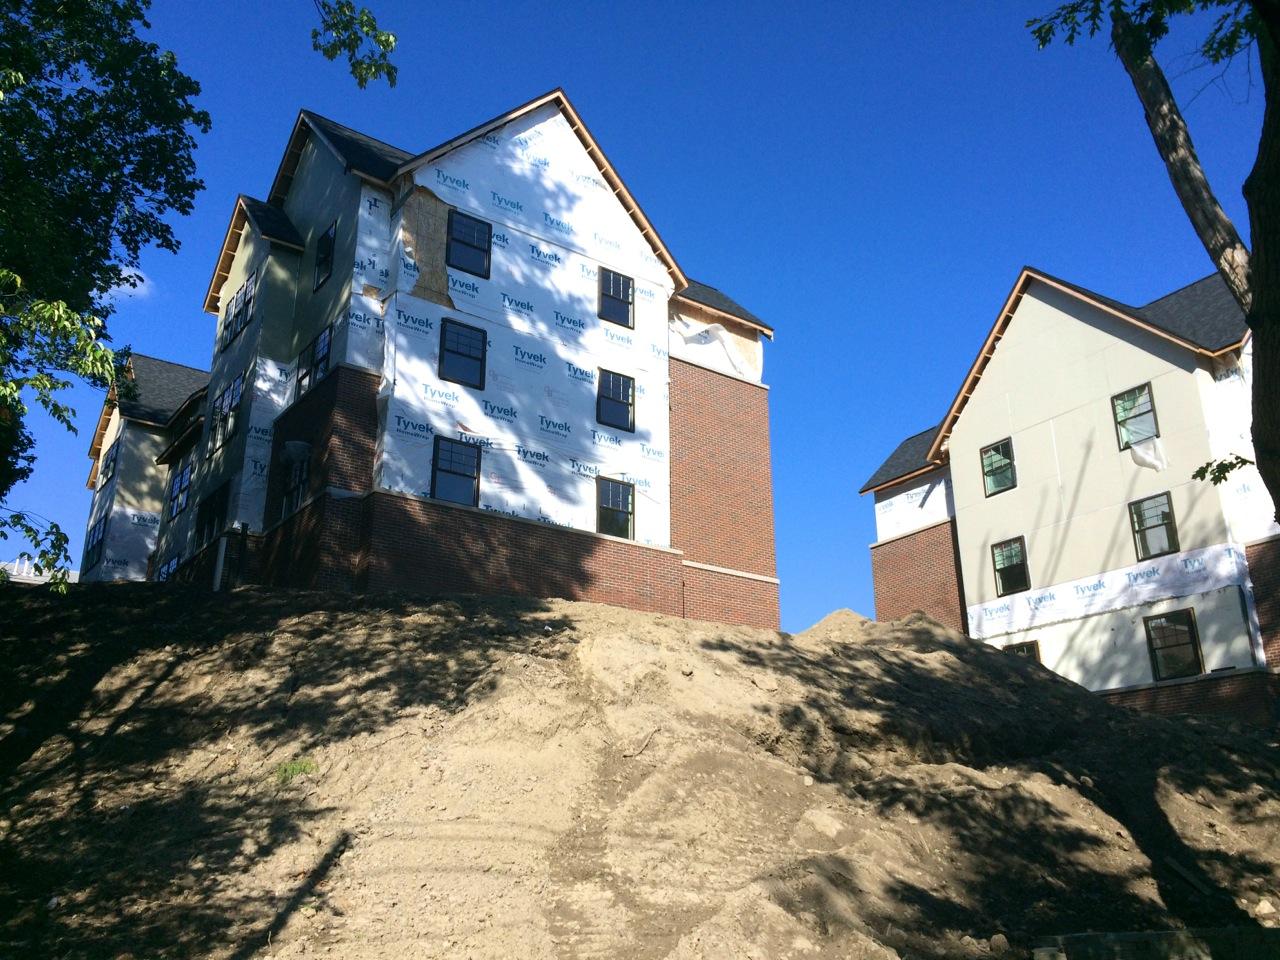 Thurston-Ave-Apartments-Ithaca-06241412